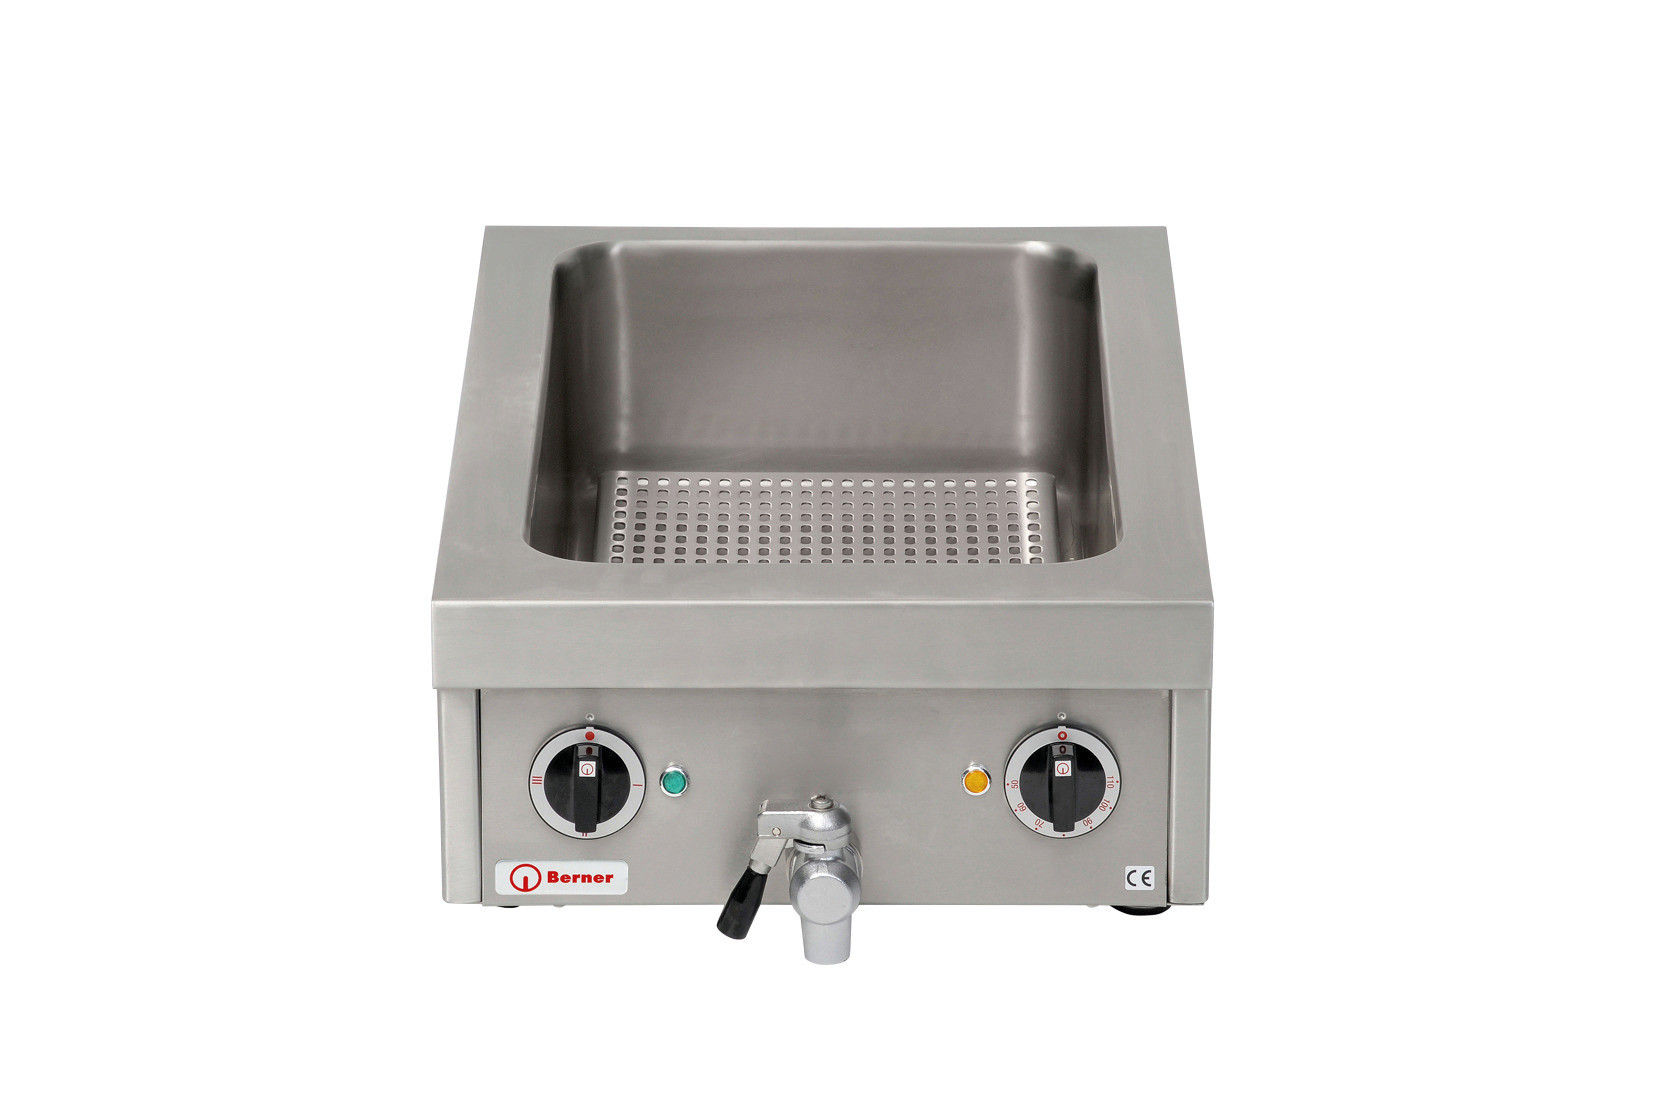 Elektro-Kocher 1 Heizzone / GN 1/1 - 150 mm tief /  / 7,00 kW